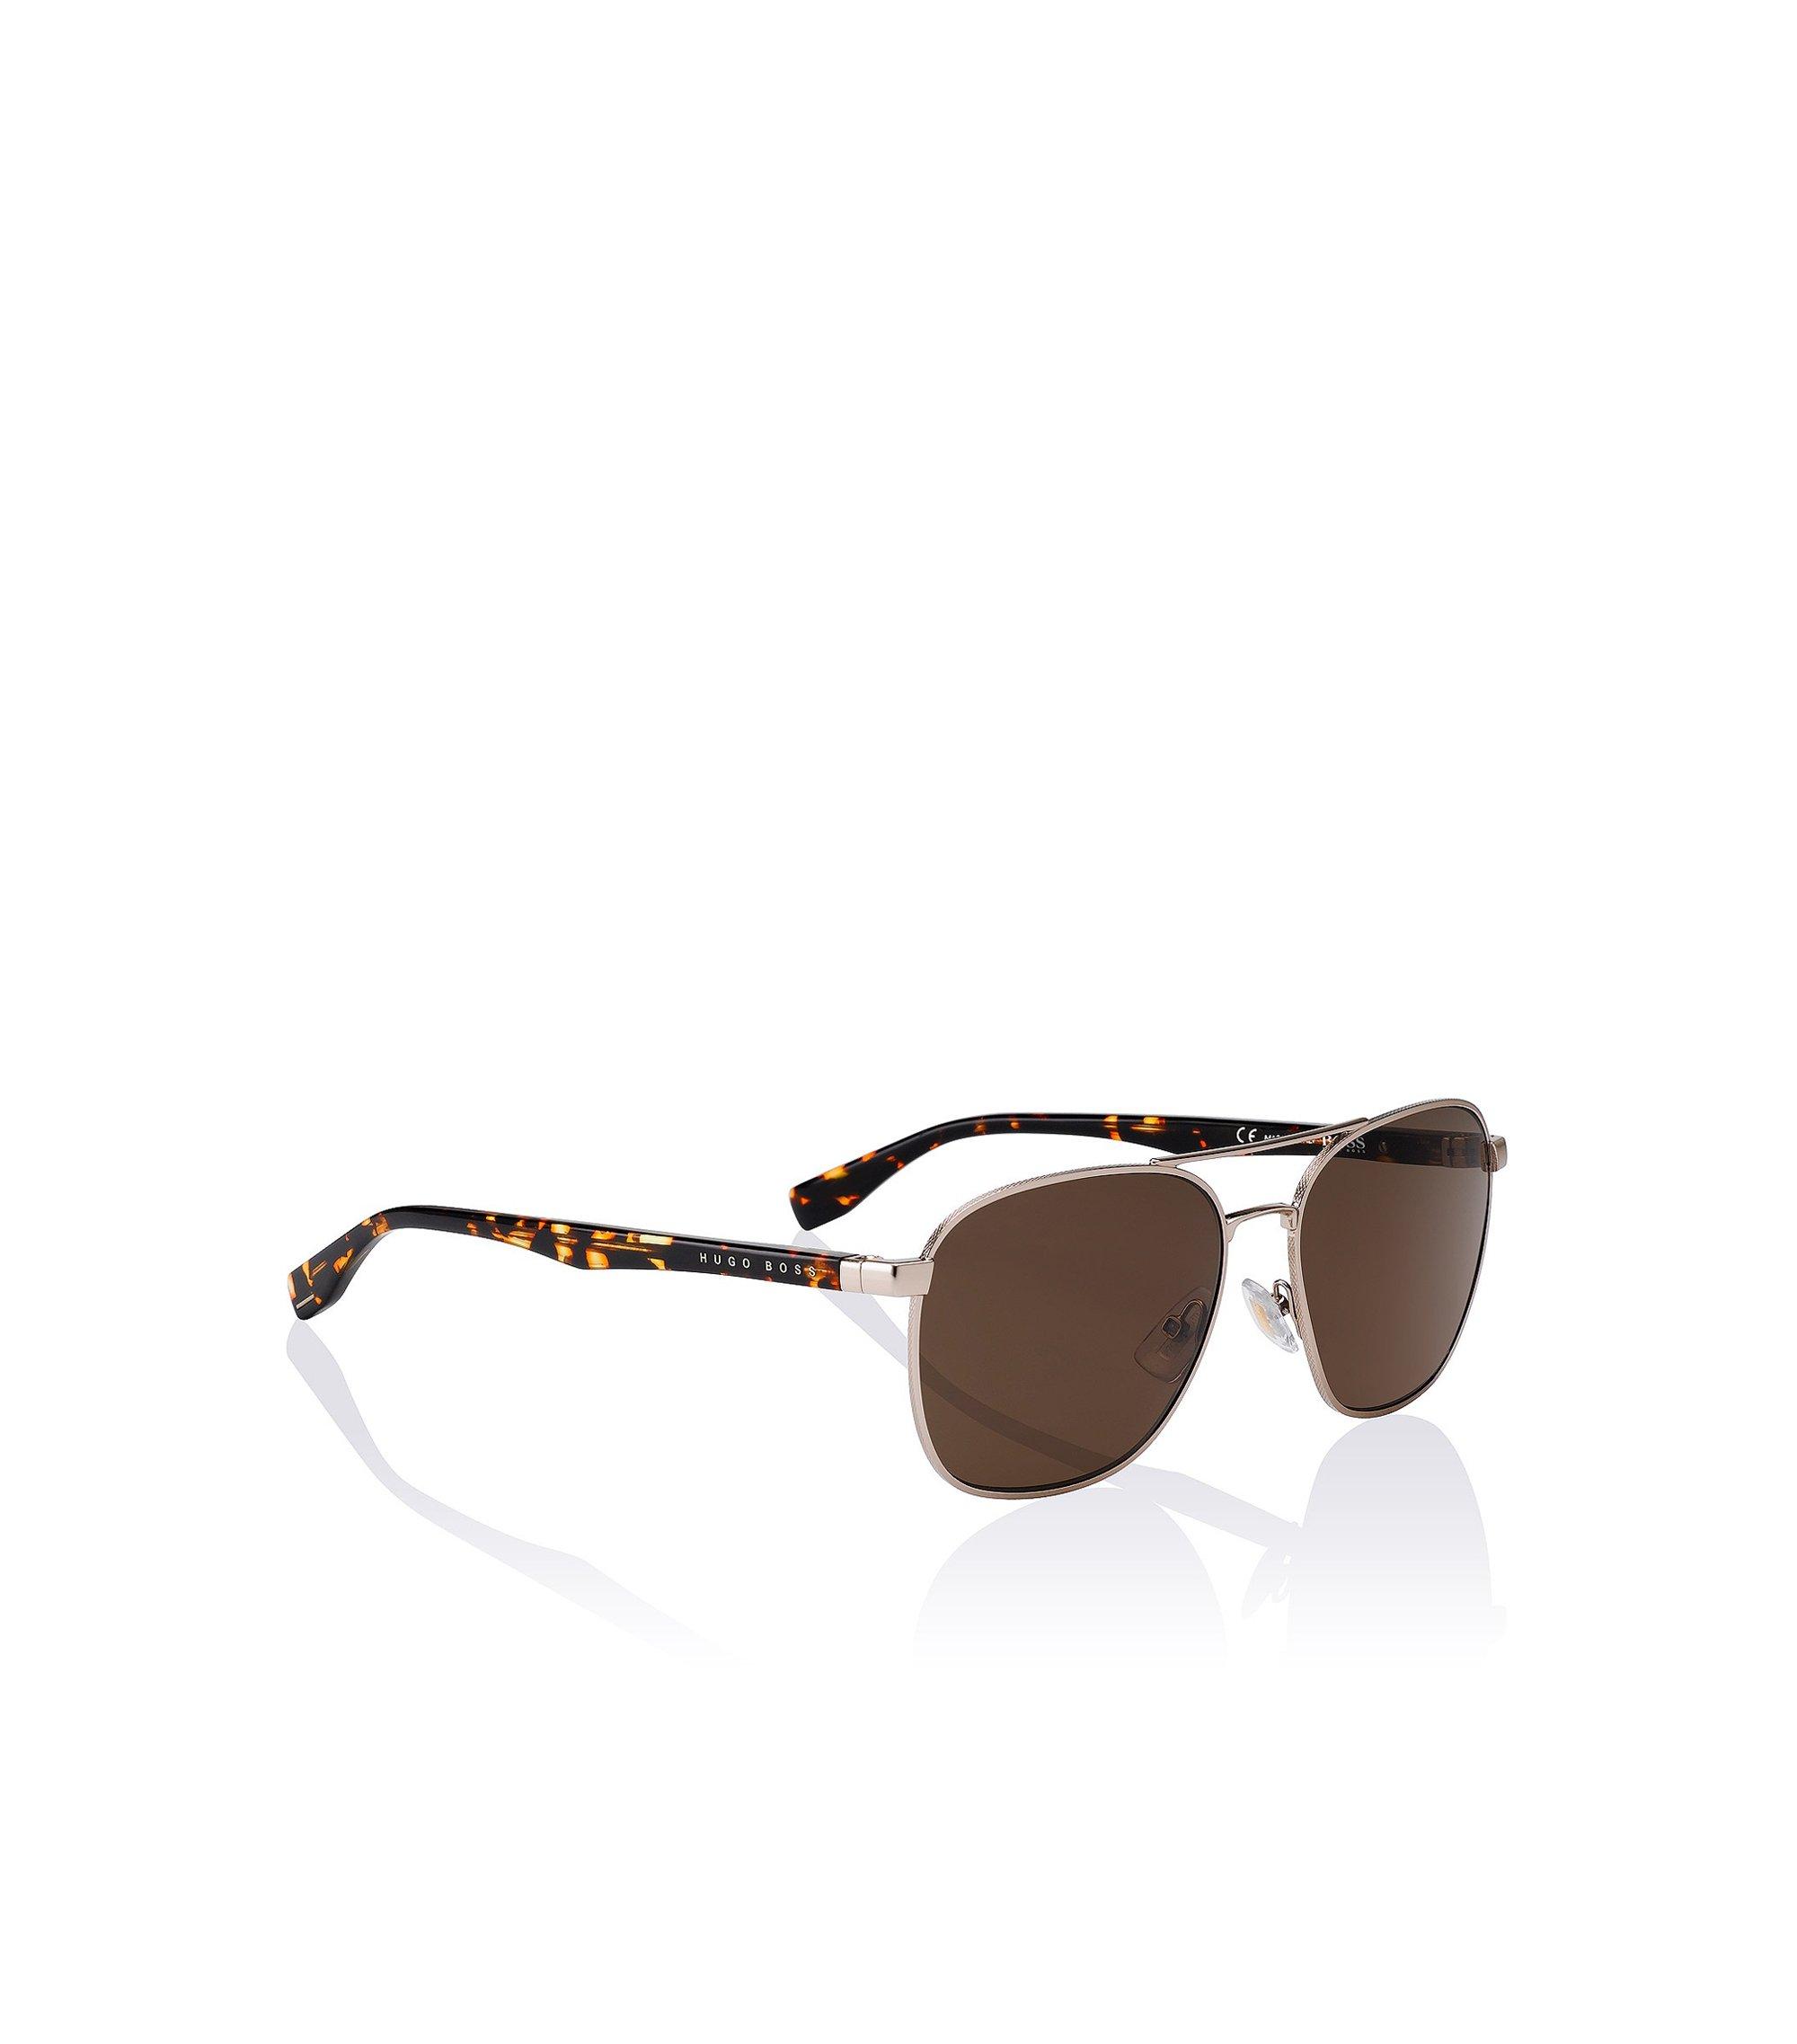 Brown Lens Navigator Sunglasses | BOSS 0701S, Assorted-Pre-Pack